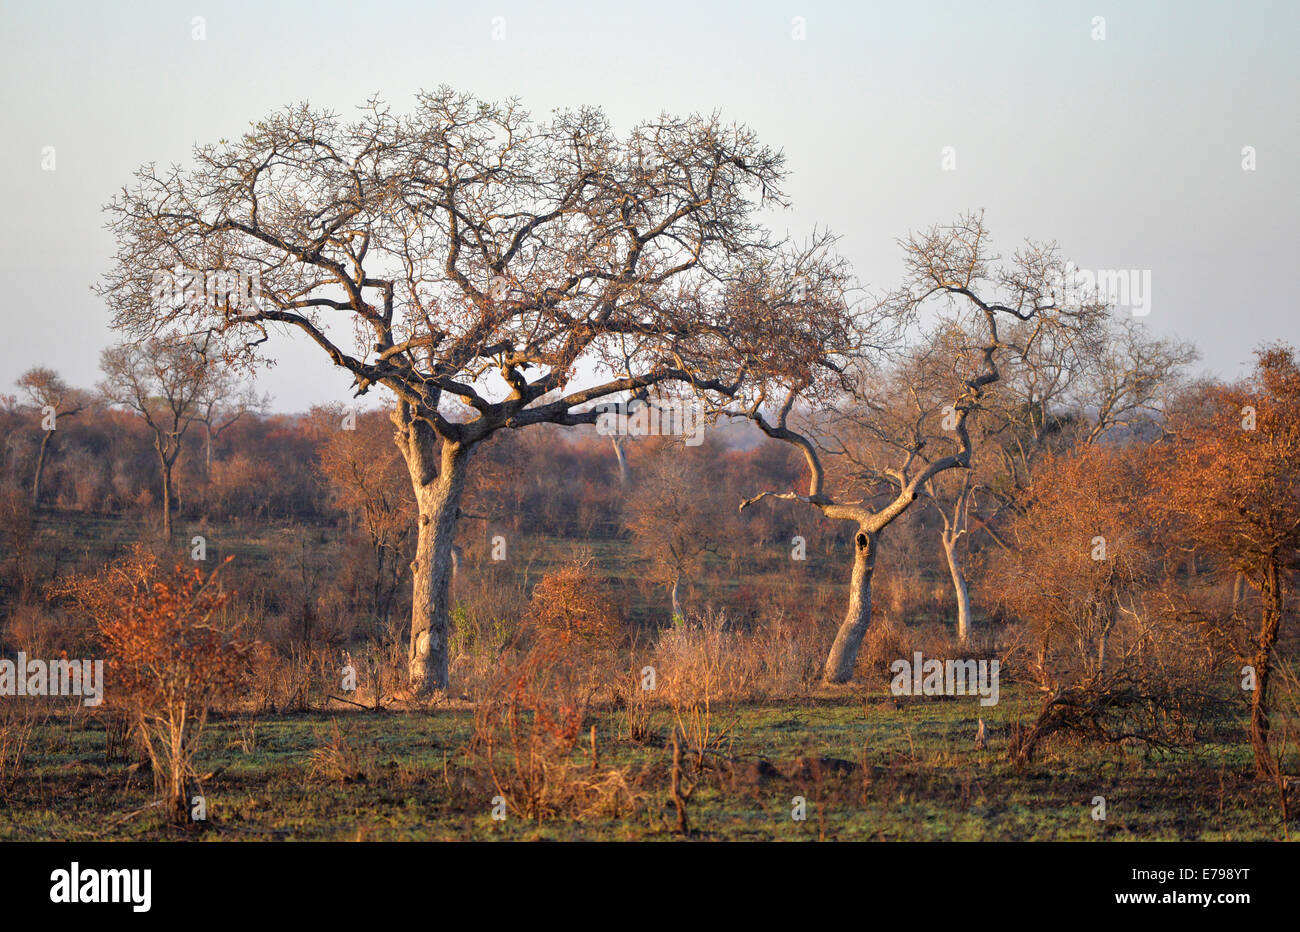 Burnt savannah in Kruger National Park, South Africa - Stock Image